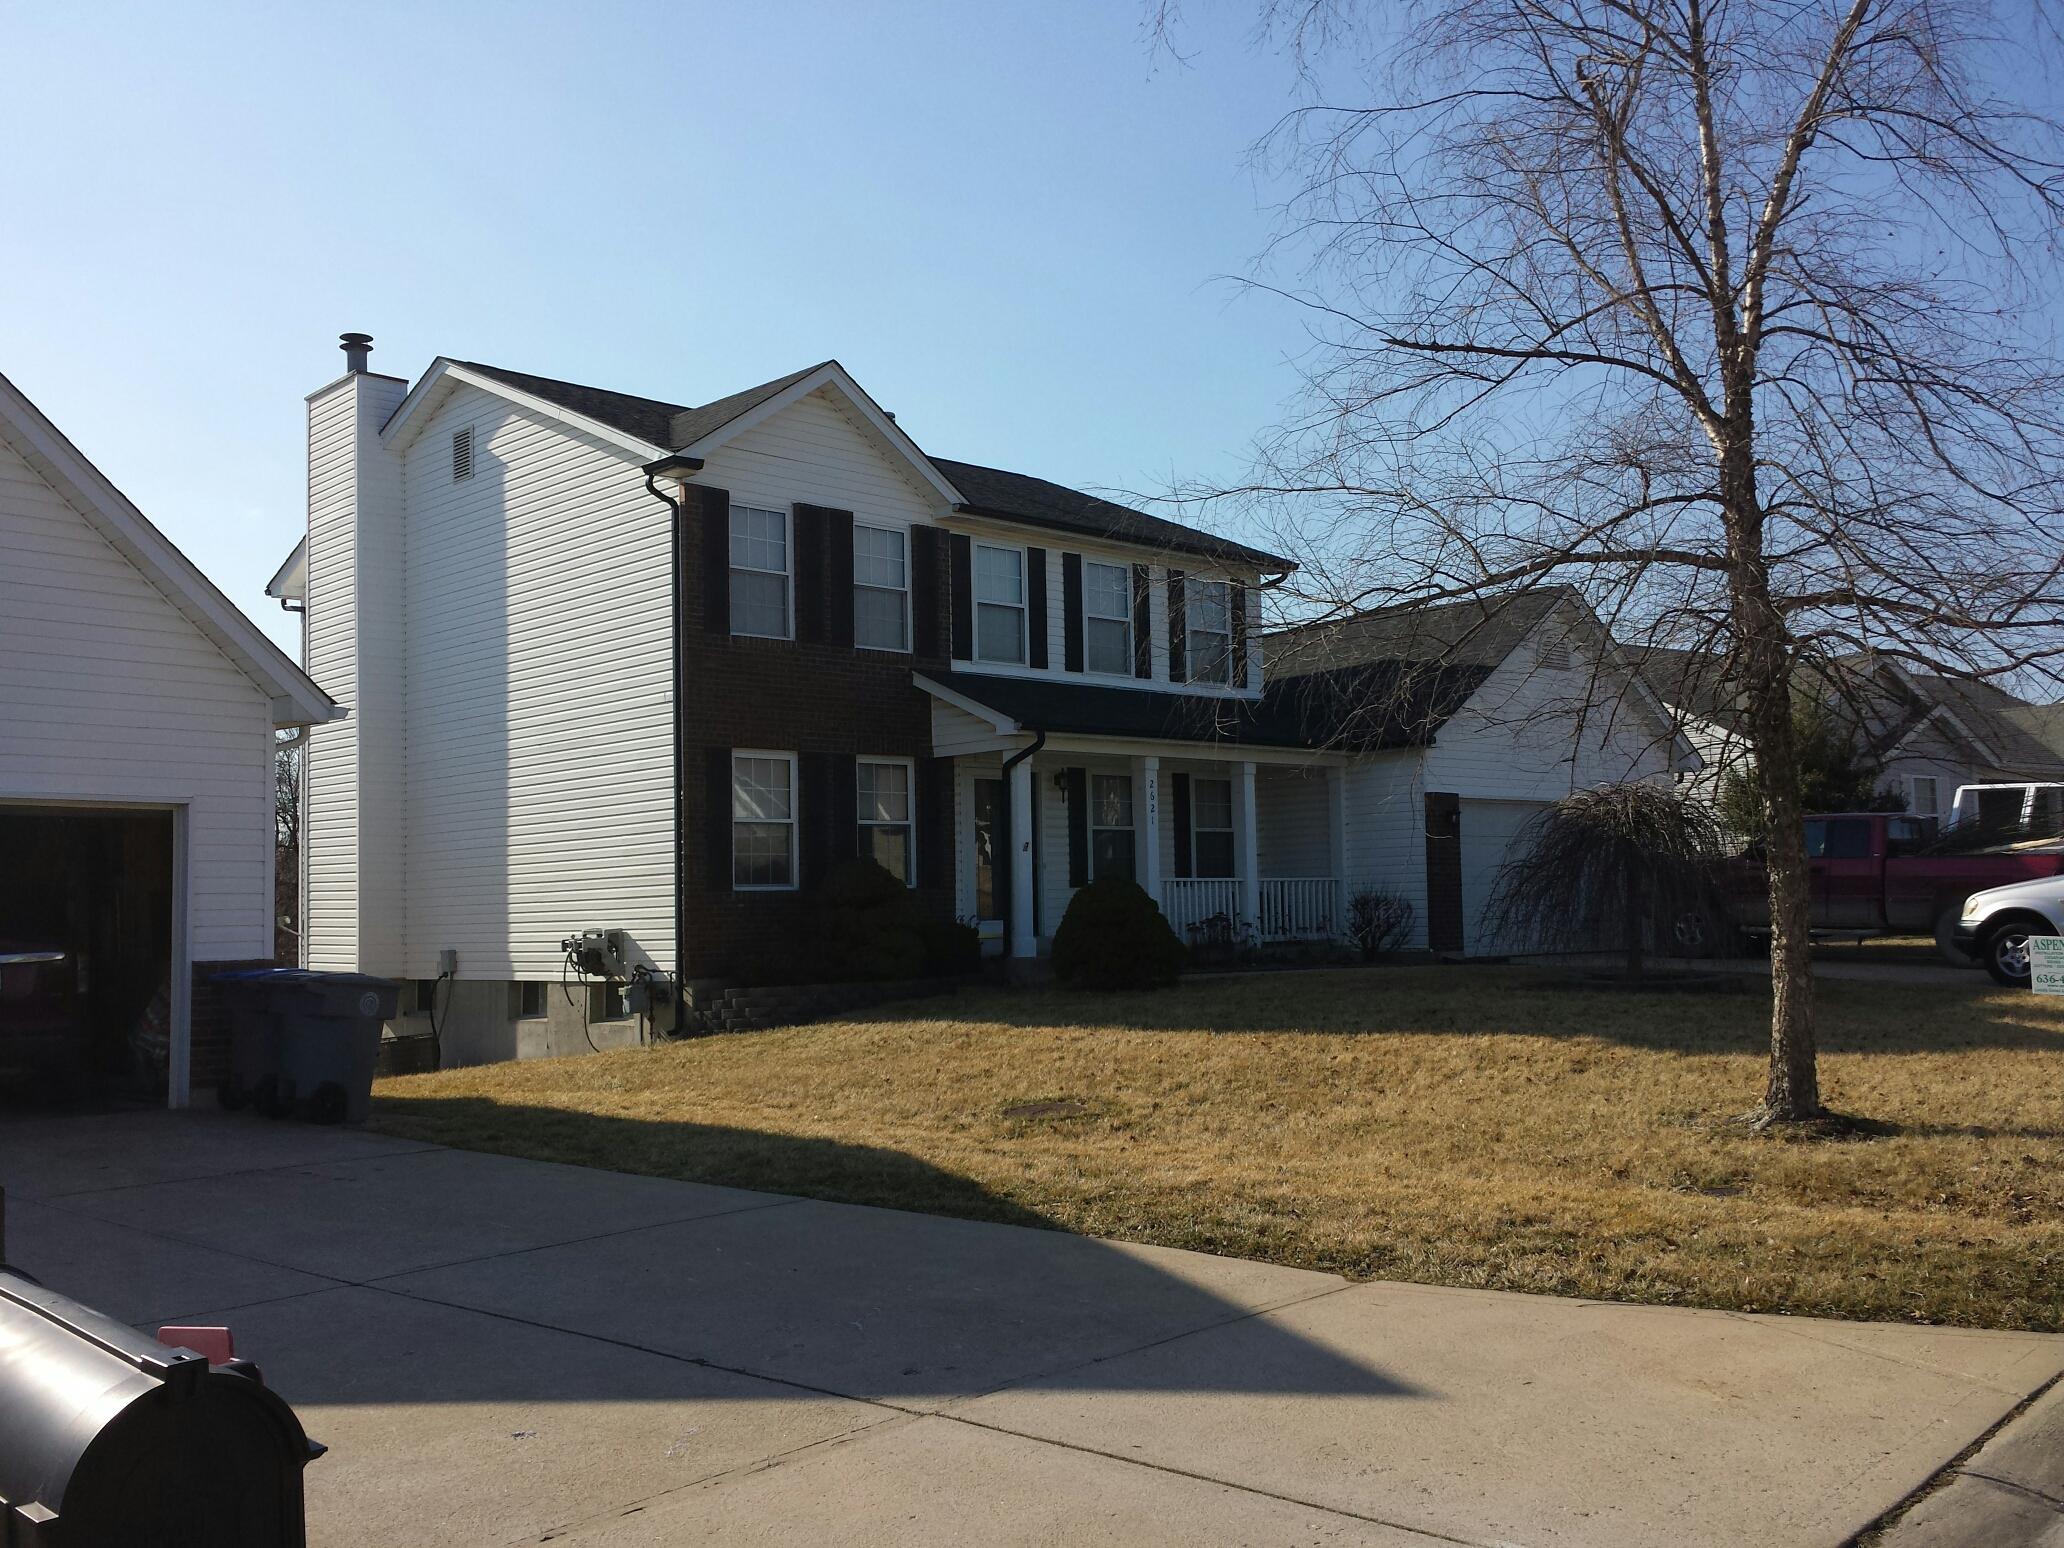 O'Fallon, MO - New roof from insurance claim. Call Joe 314-5507369